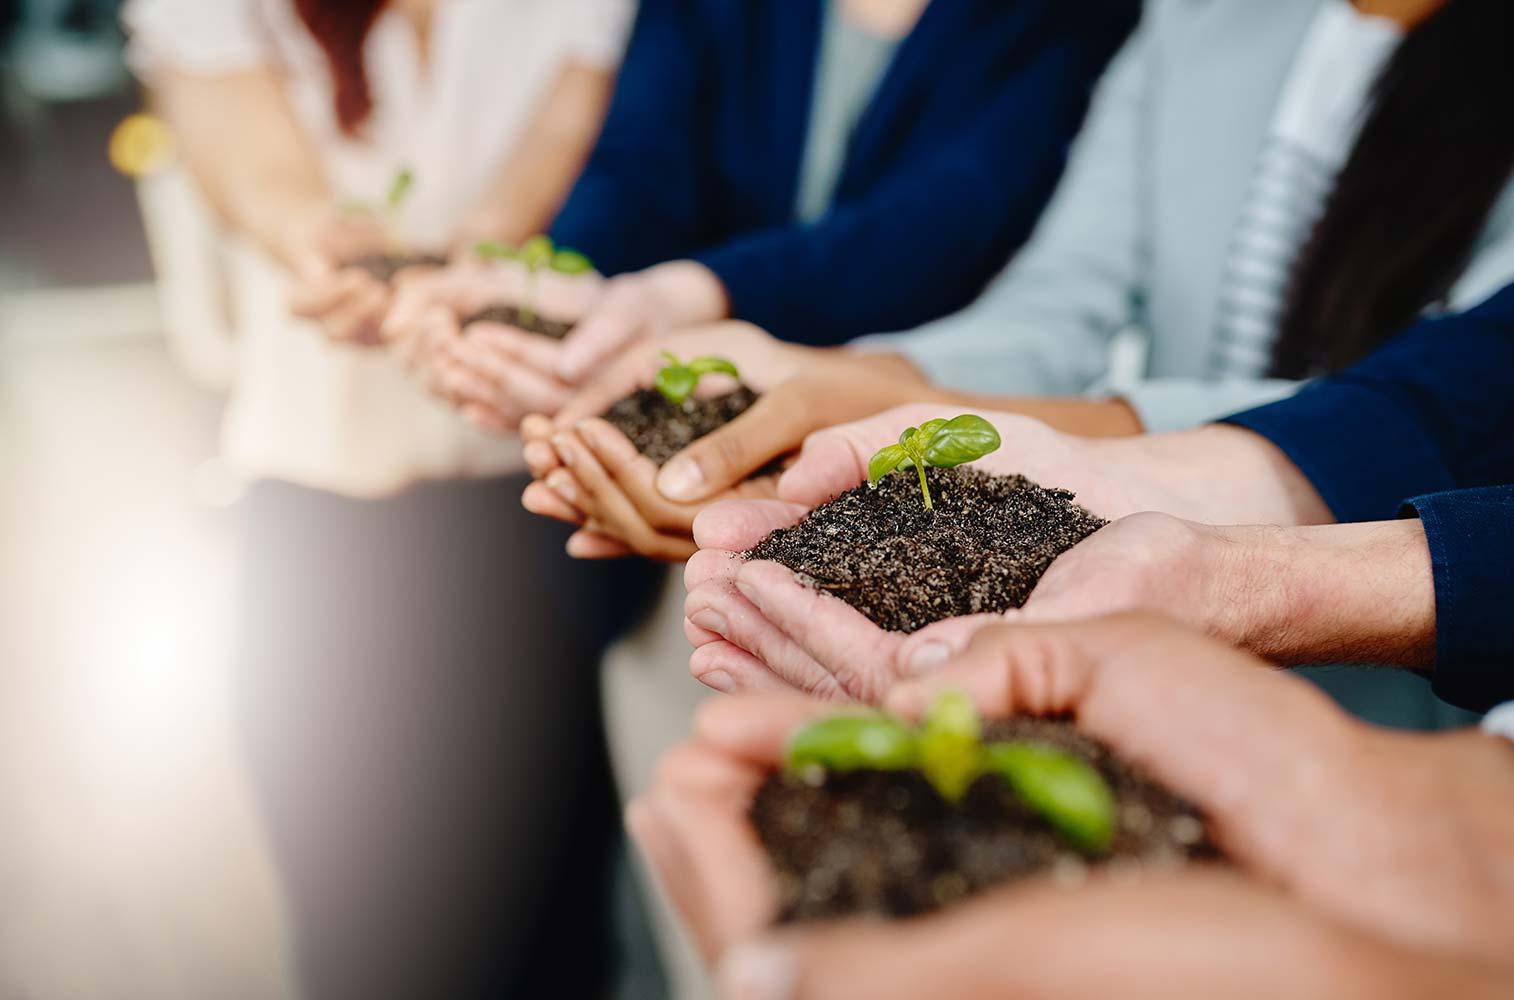 Comovee Corporate Social Responsibility